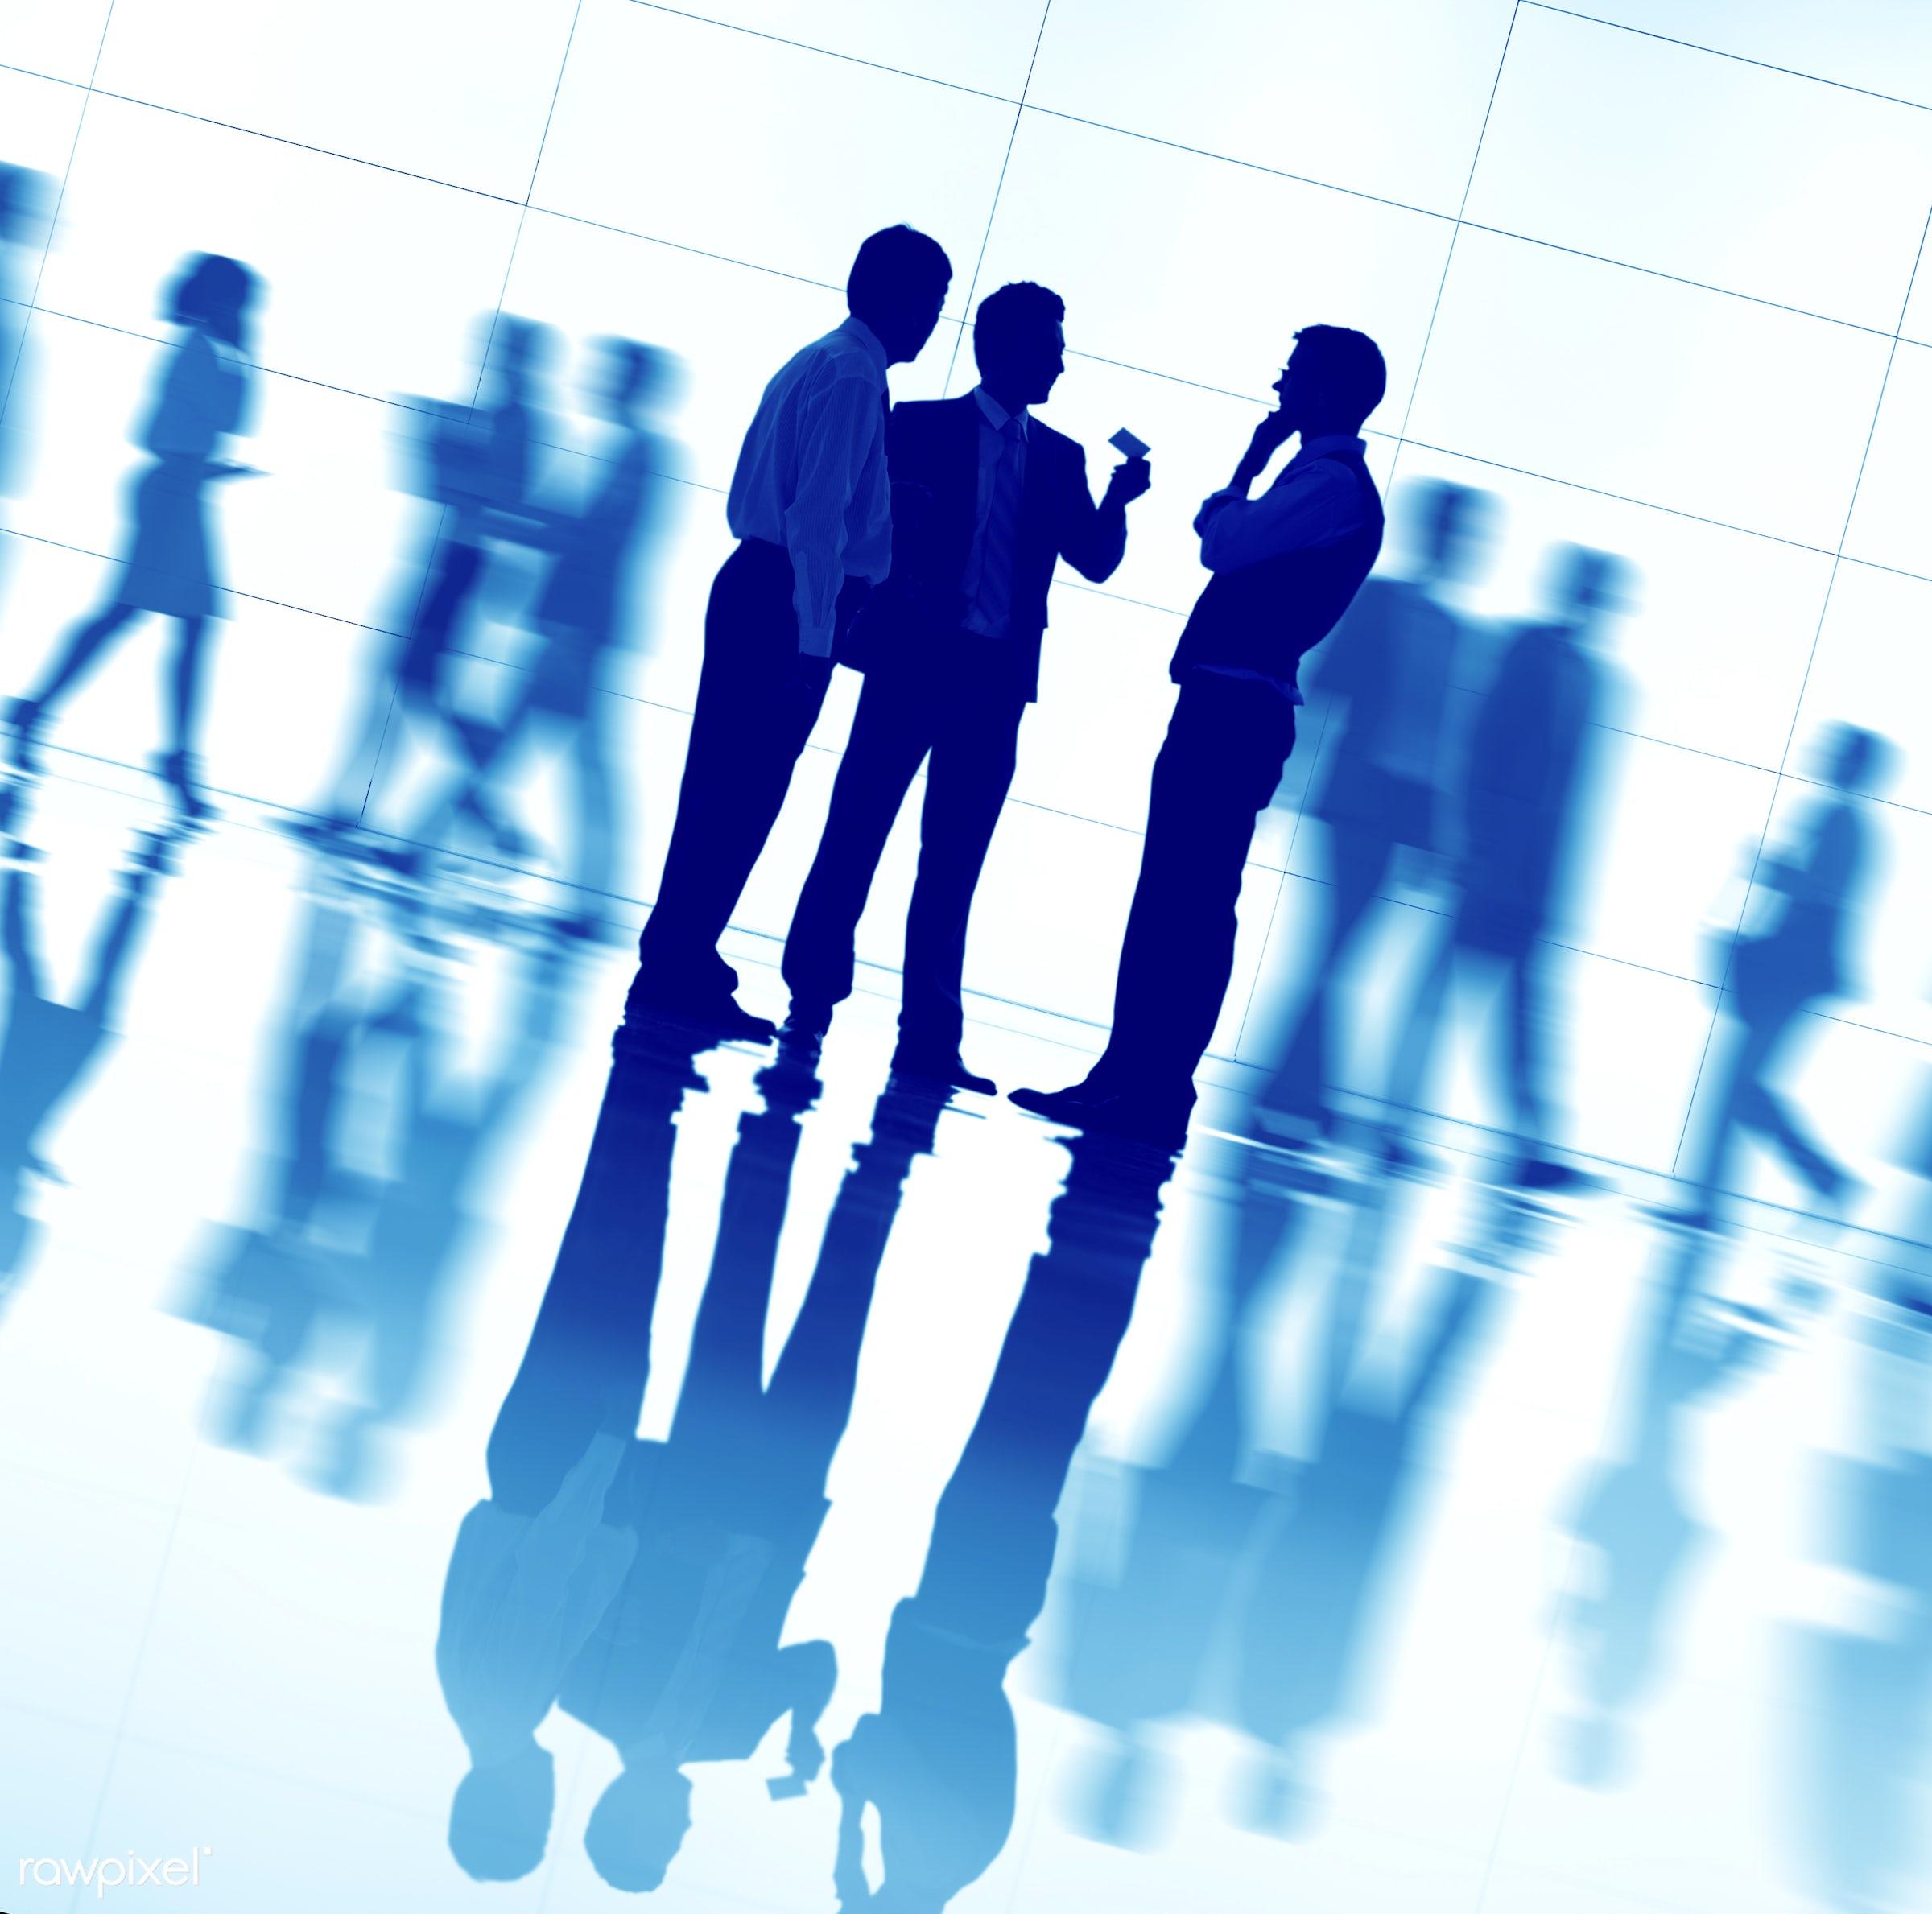 agreement, back lit, blue, brainstorming, business, business people, businessmen, businesswomen, busy, colleague,...